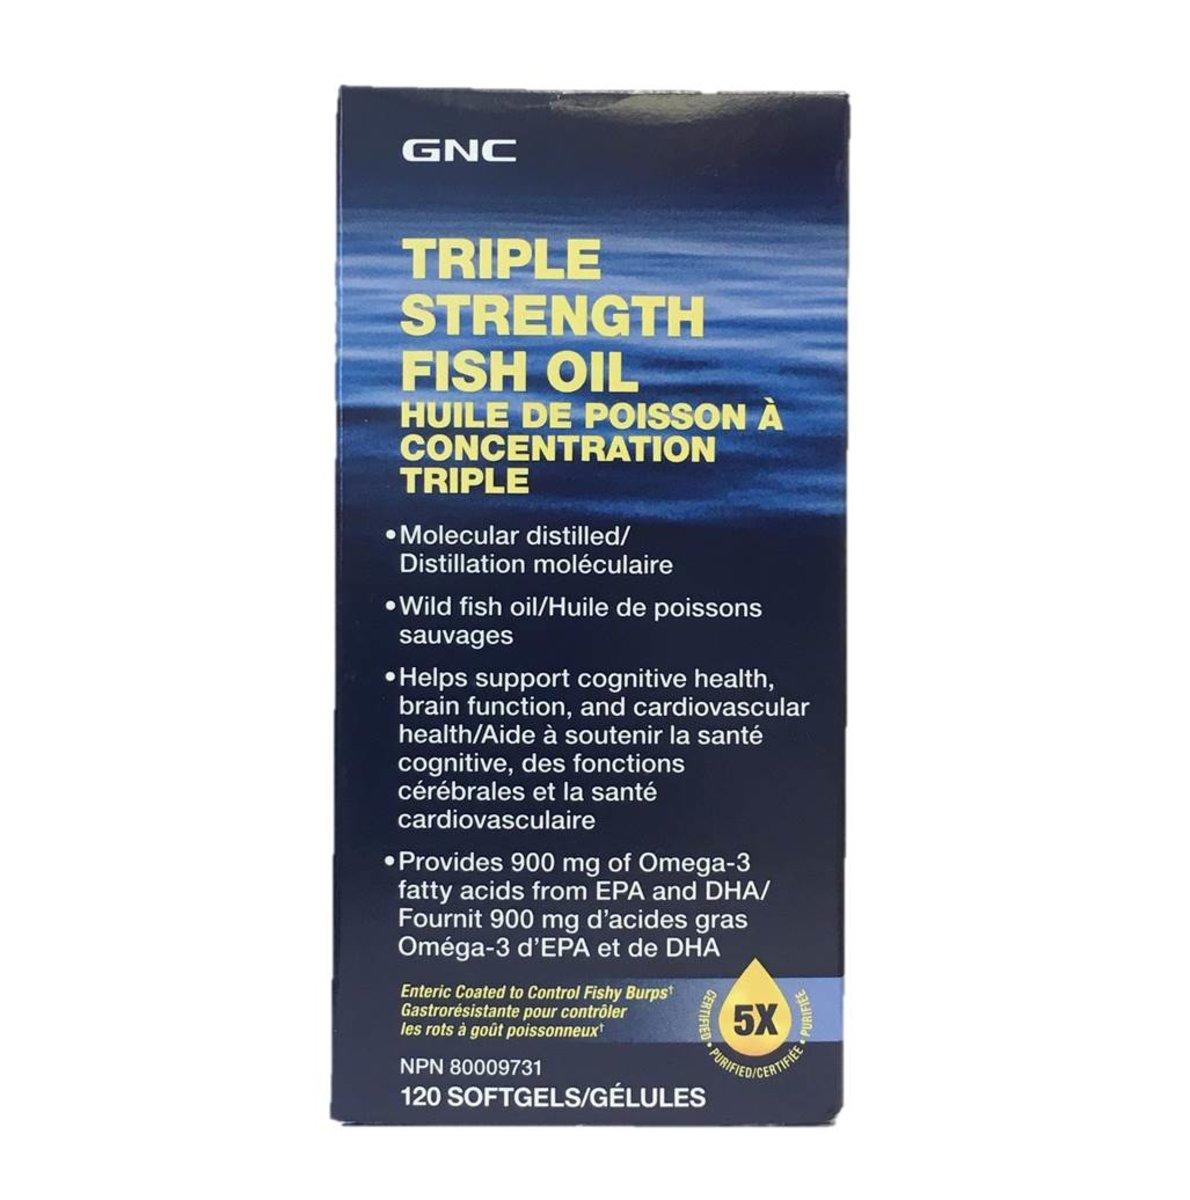 Triple Strength Fish Oil 120 softgels